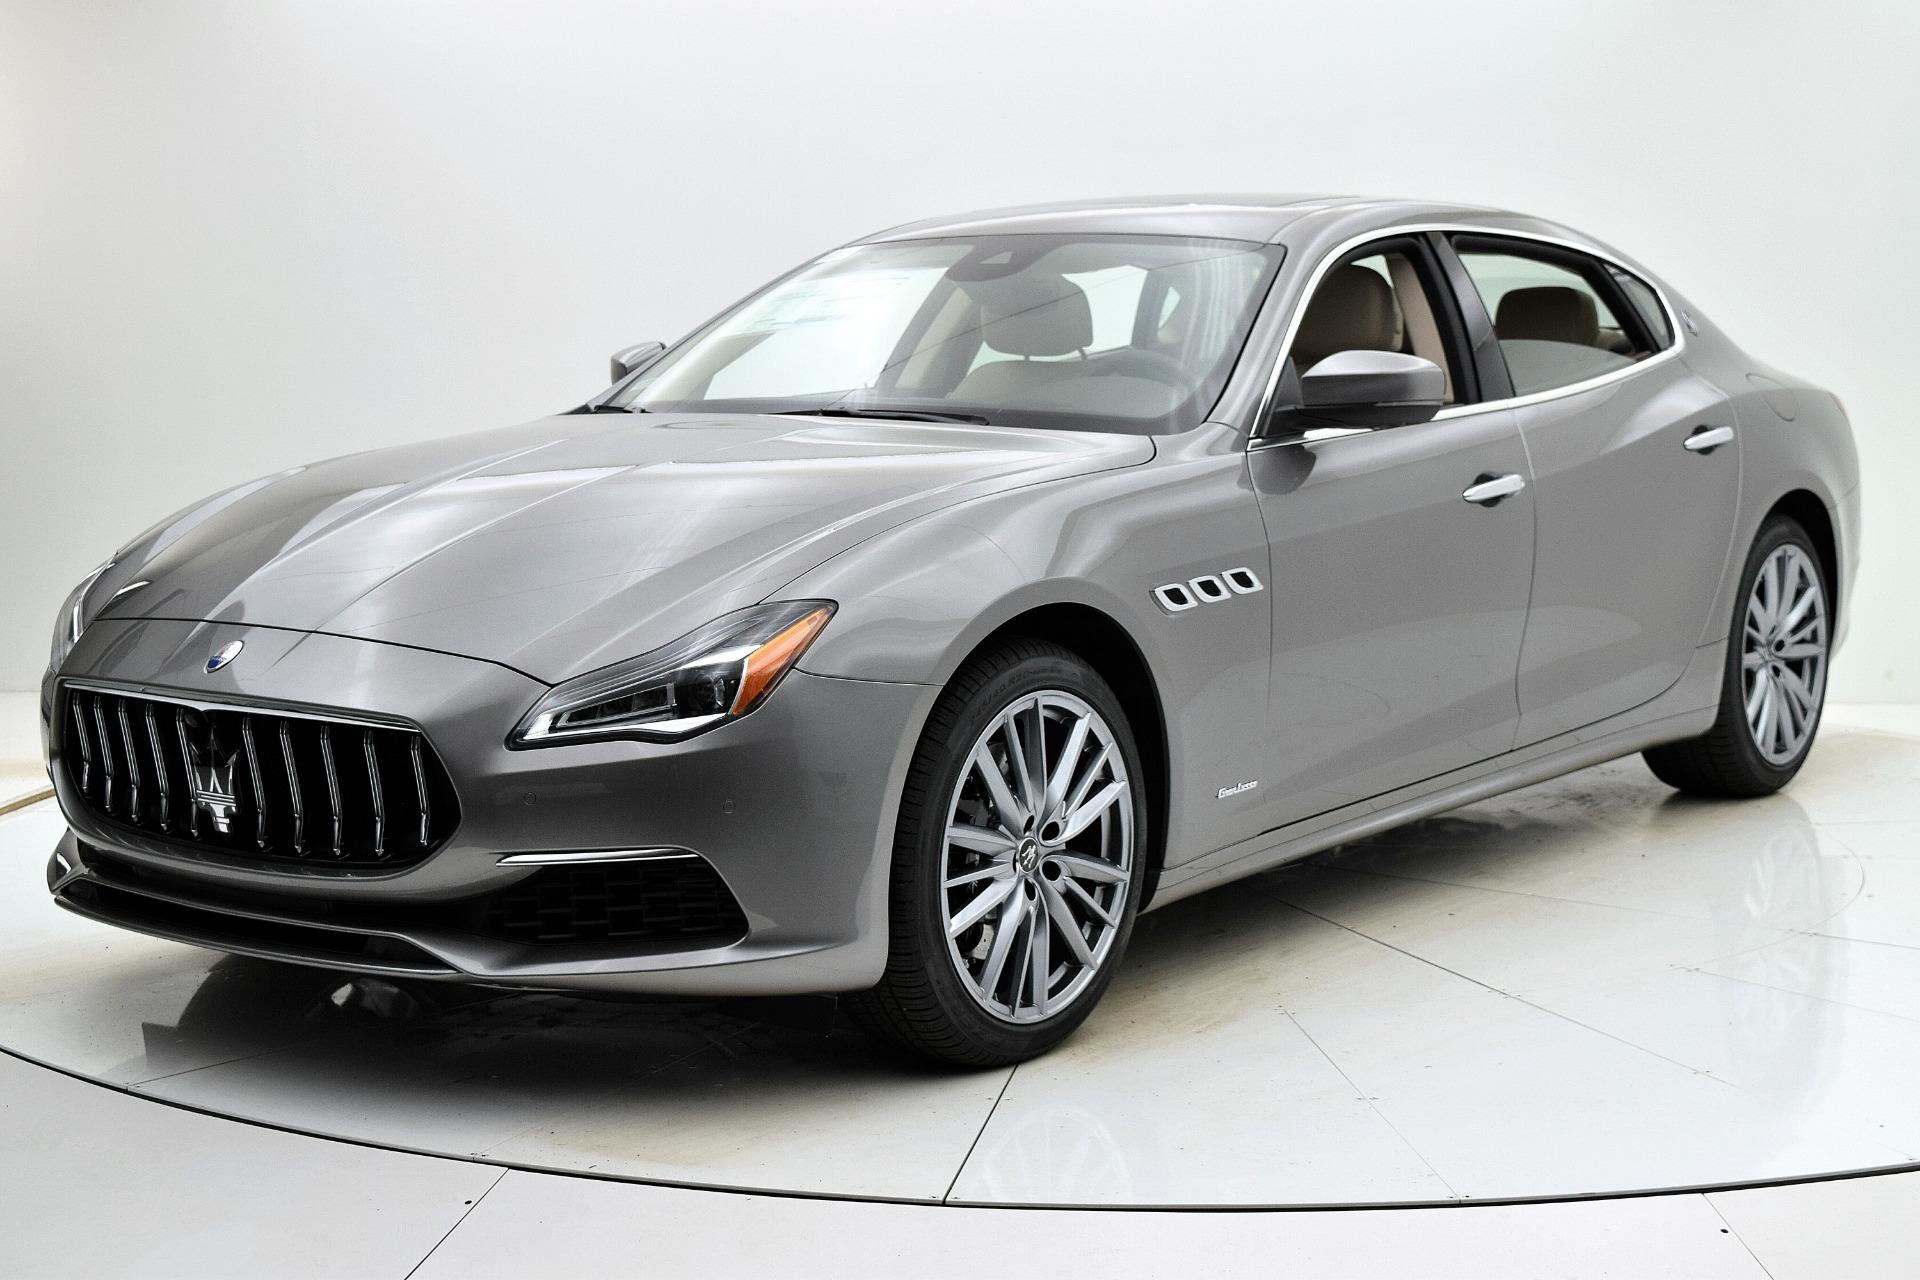 New 2021 Maserati Quattroporte SQ4 GranLusso for sale Sold at F.C. Kerbeck Rolls-Royce in Palmyra NJ 08065 2